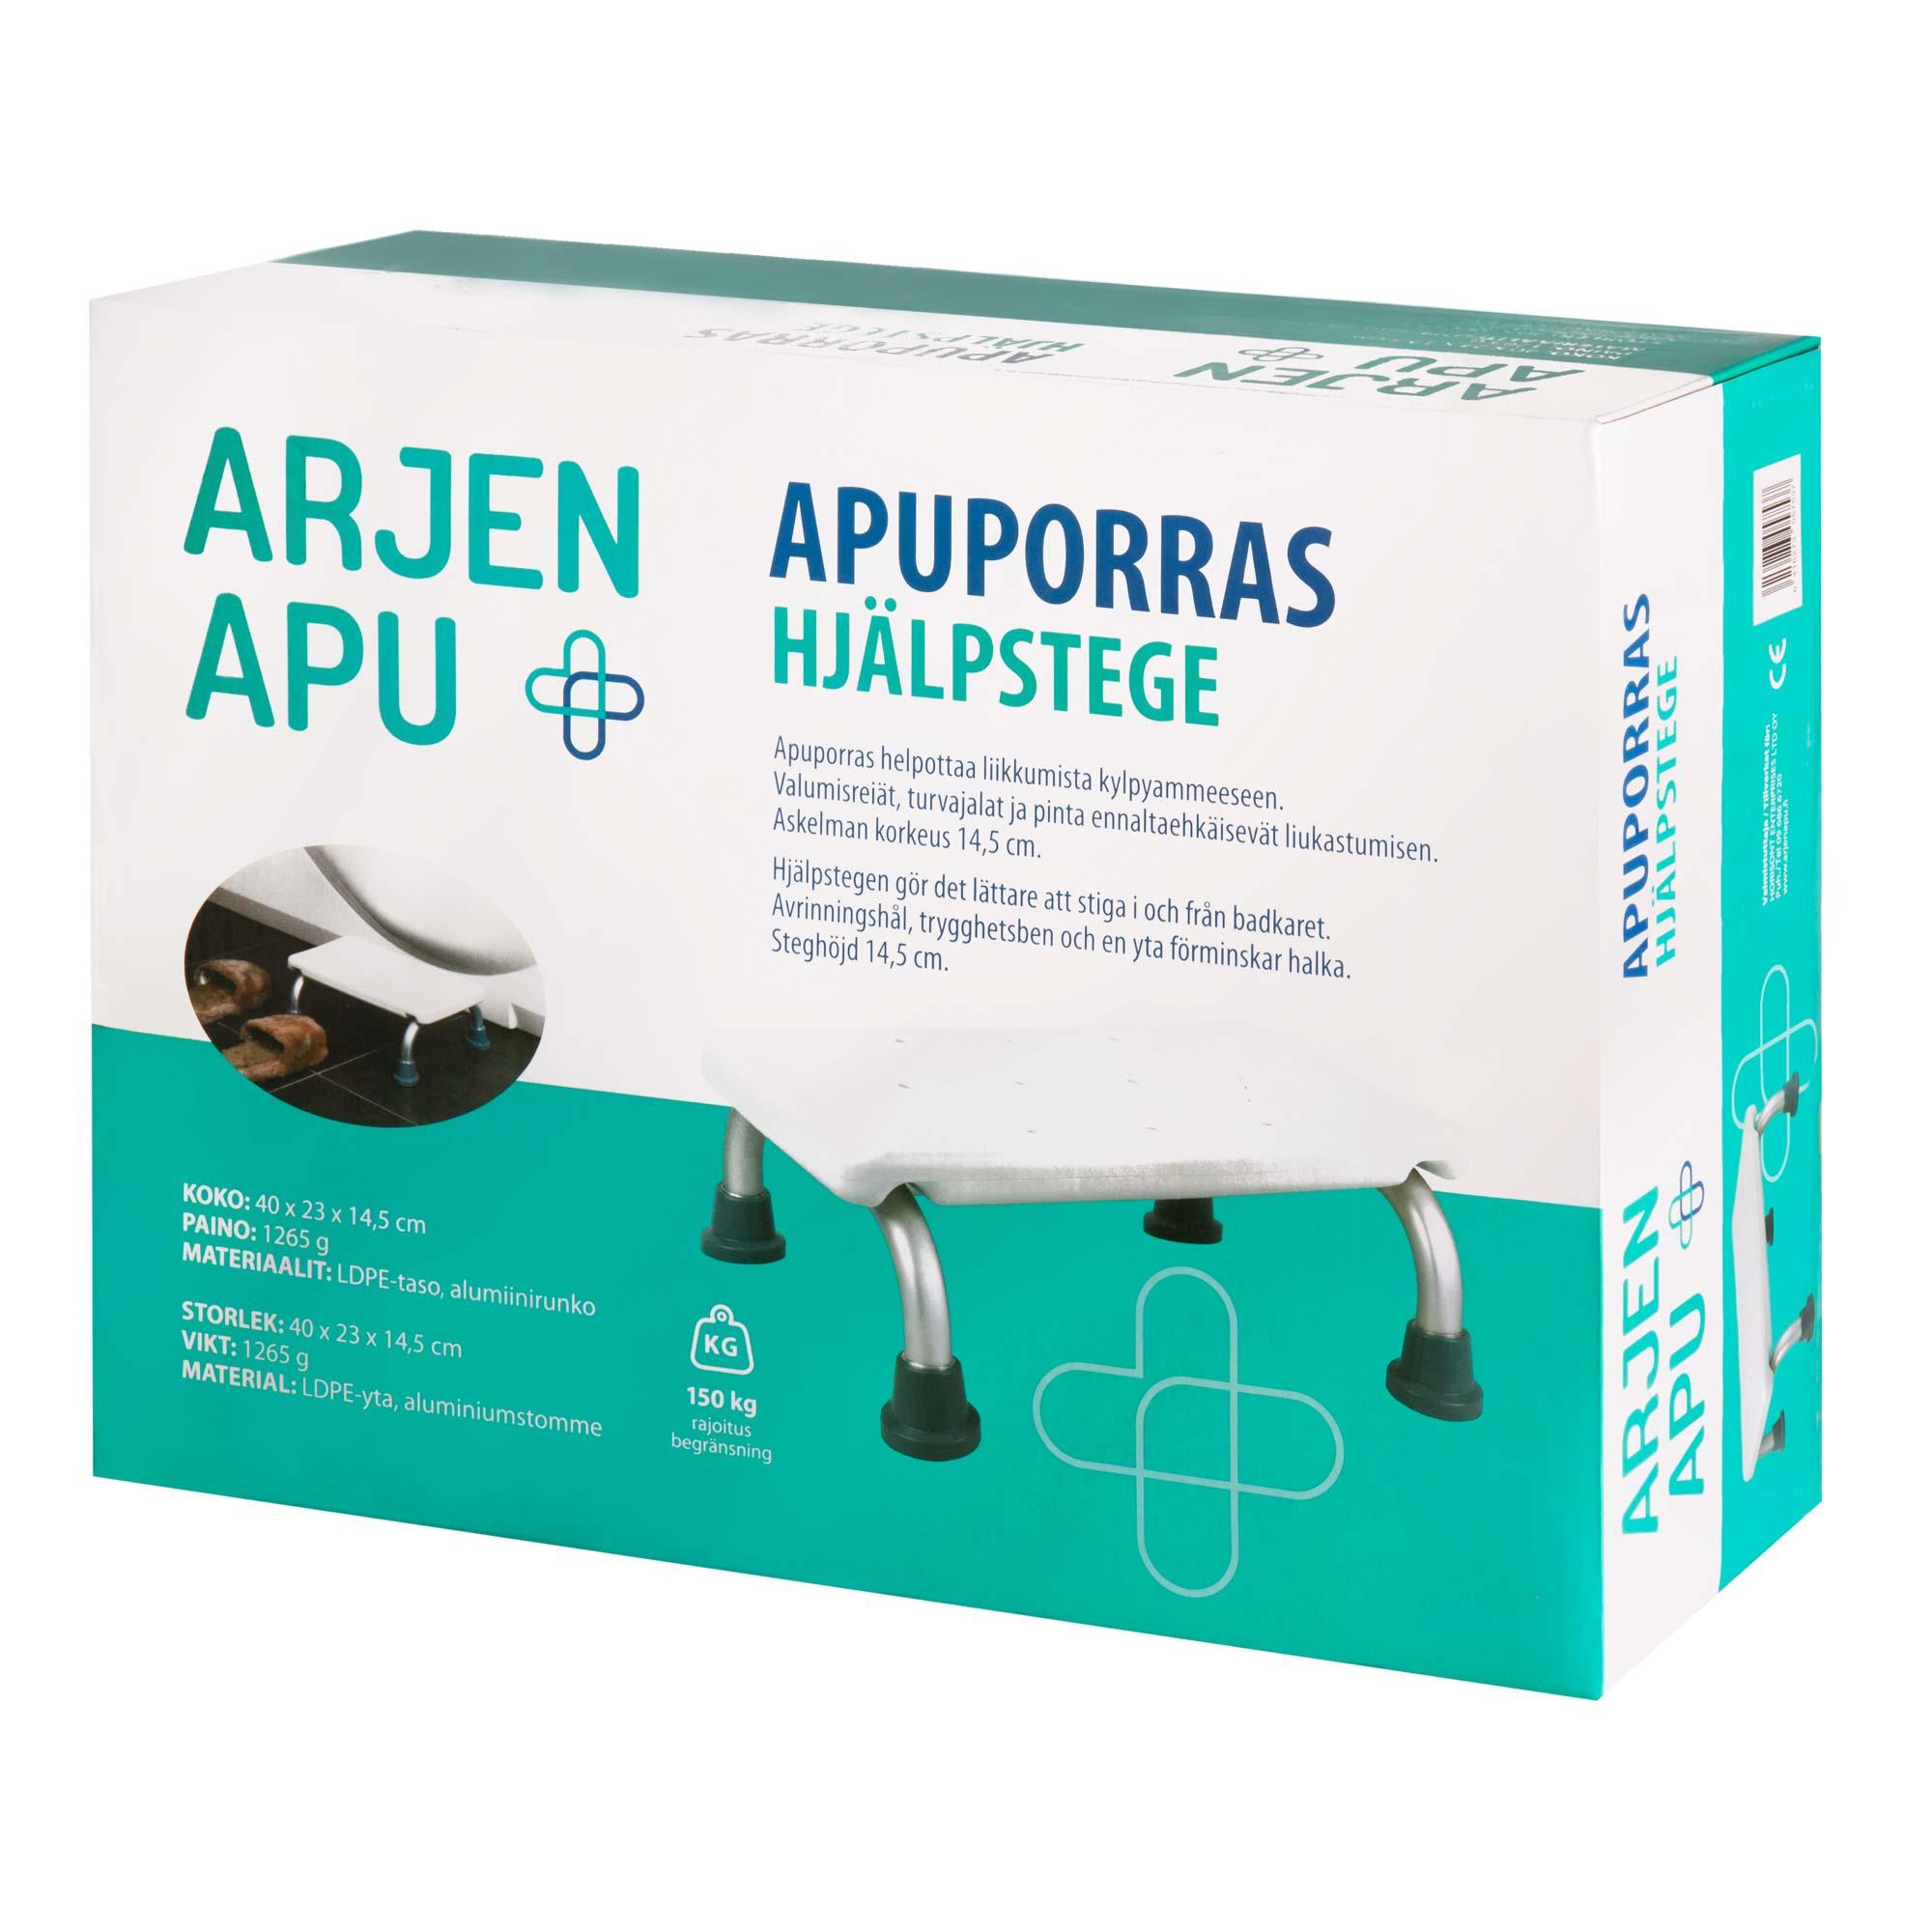 Apuporras, APU-7